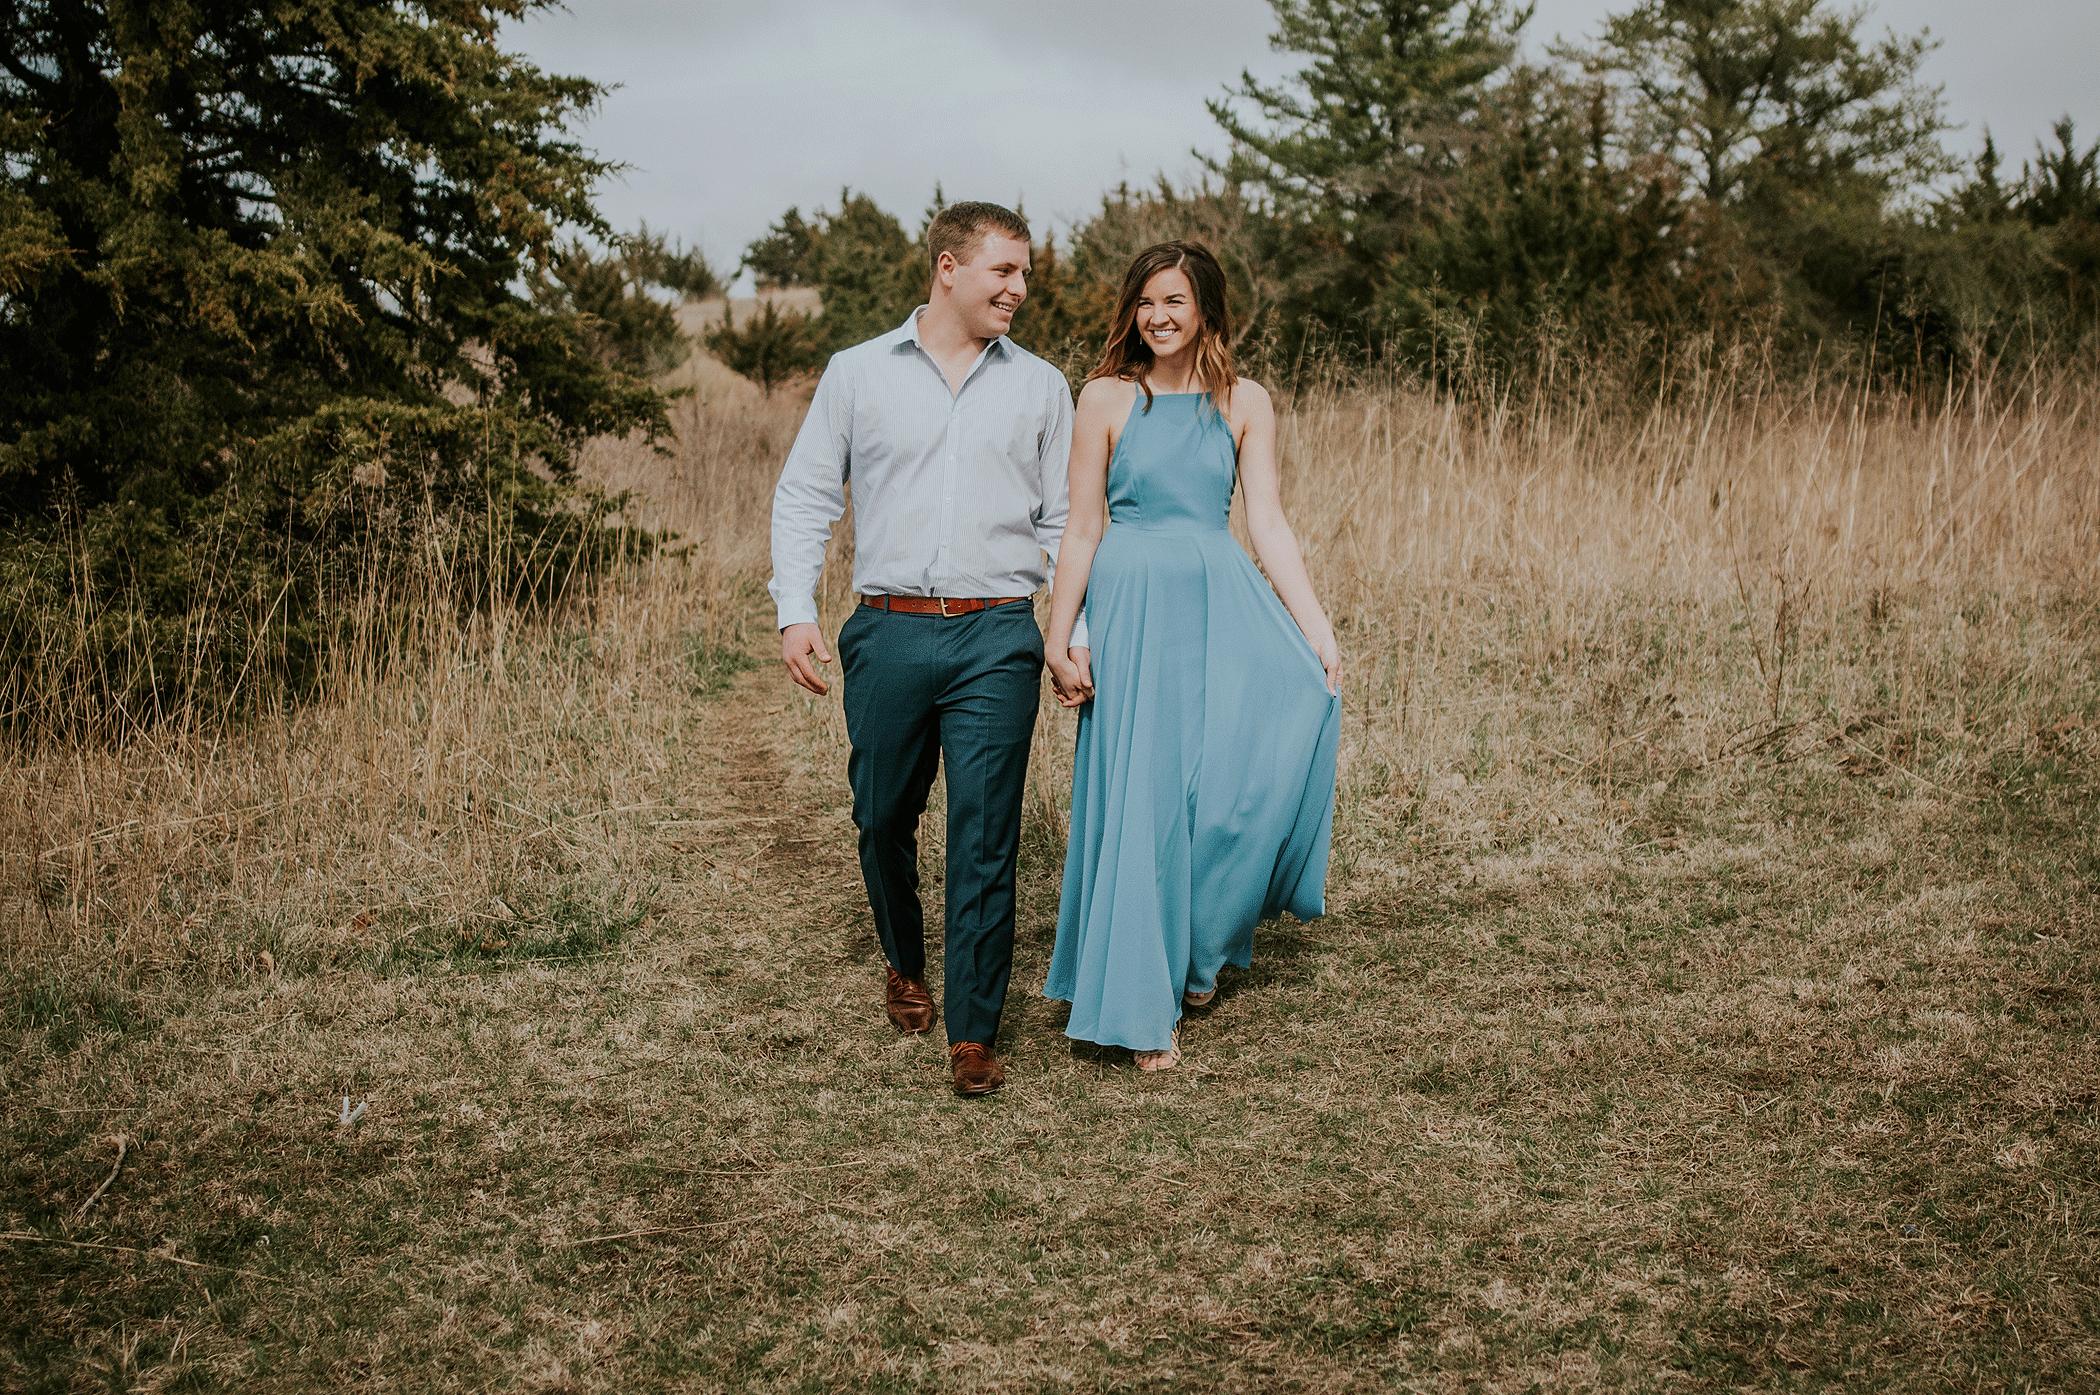 kaylie-sirek-nebraska-wedding-engagement-photographer-photography-grand-island-kearney-hastings-lincoln-02.png